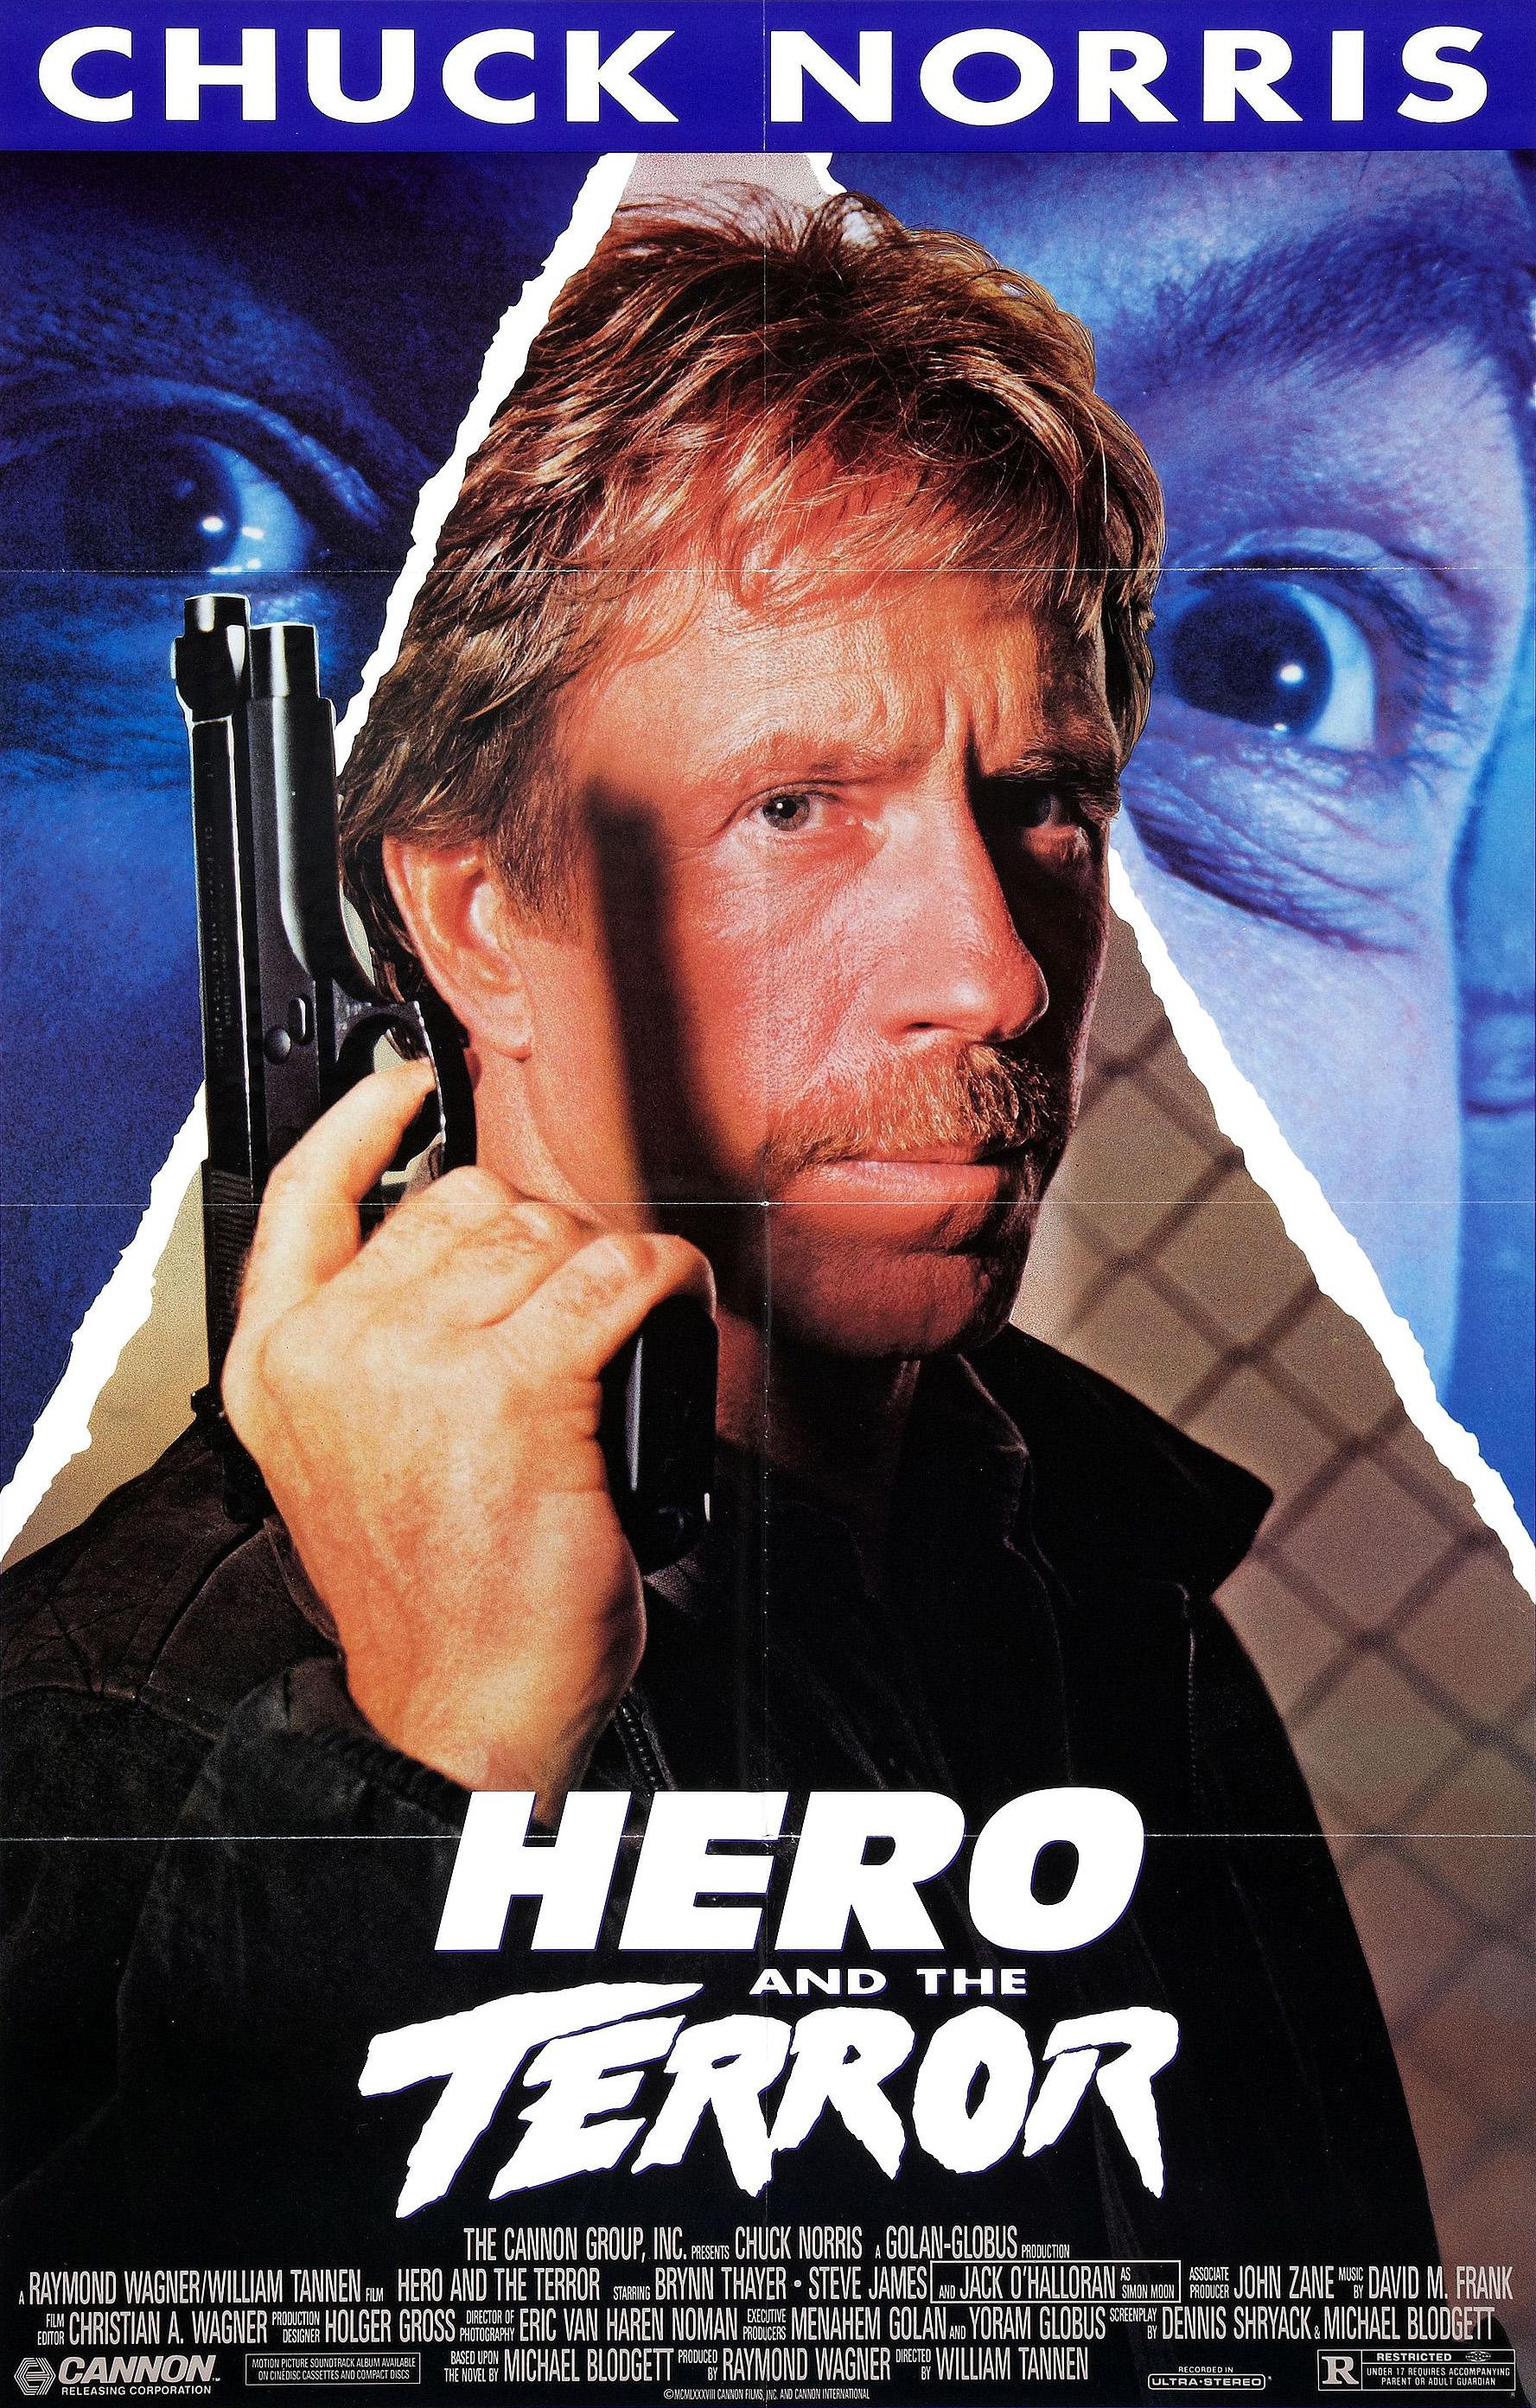 O Herói e o Terror [Dub] – IMDB 5.3